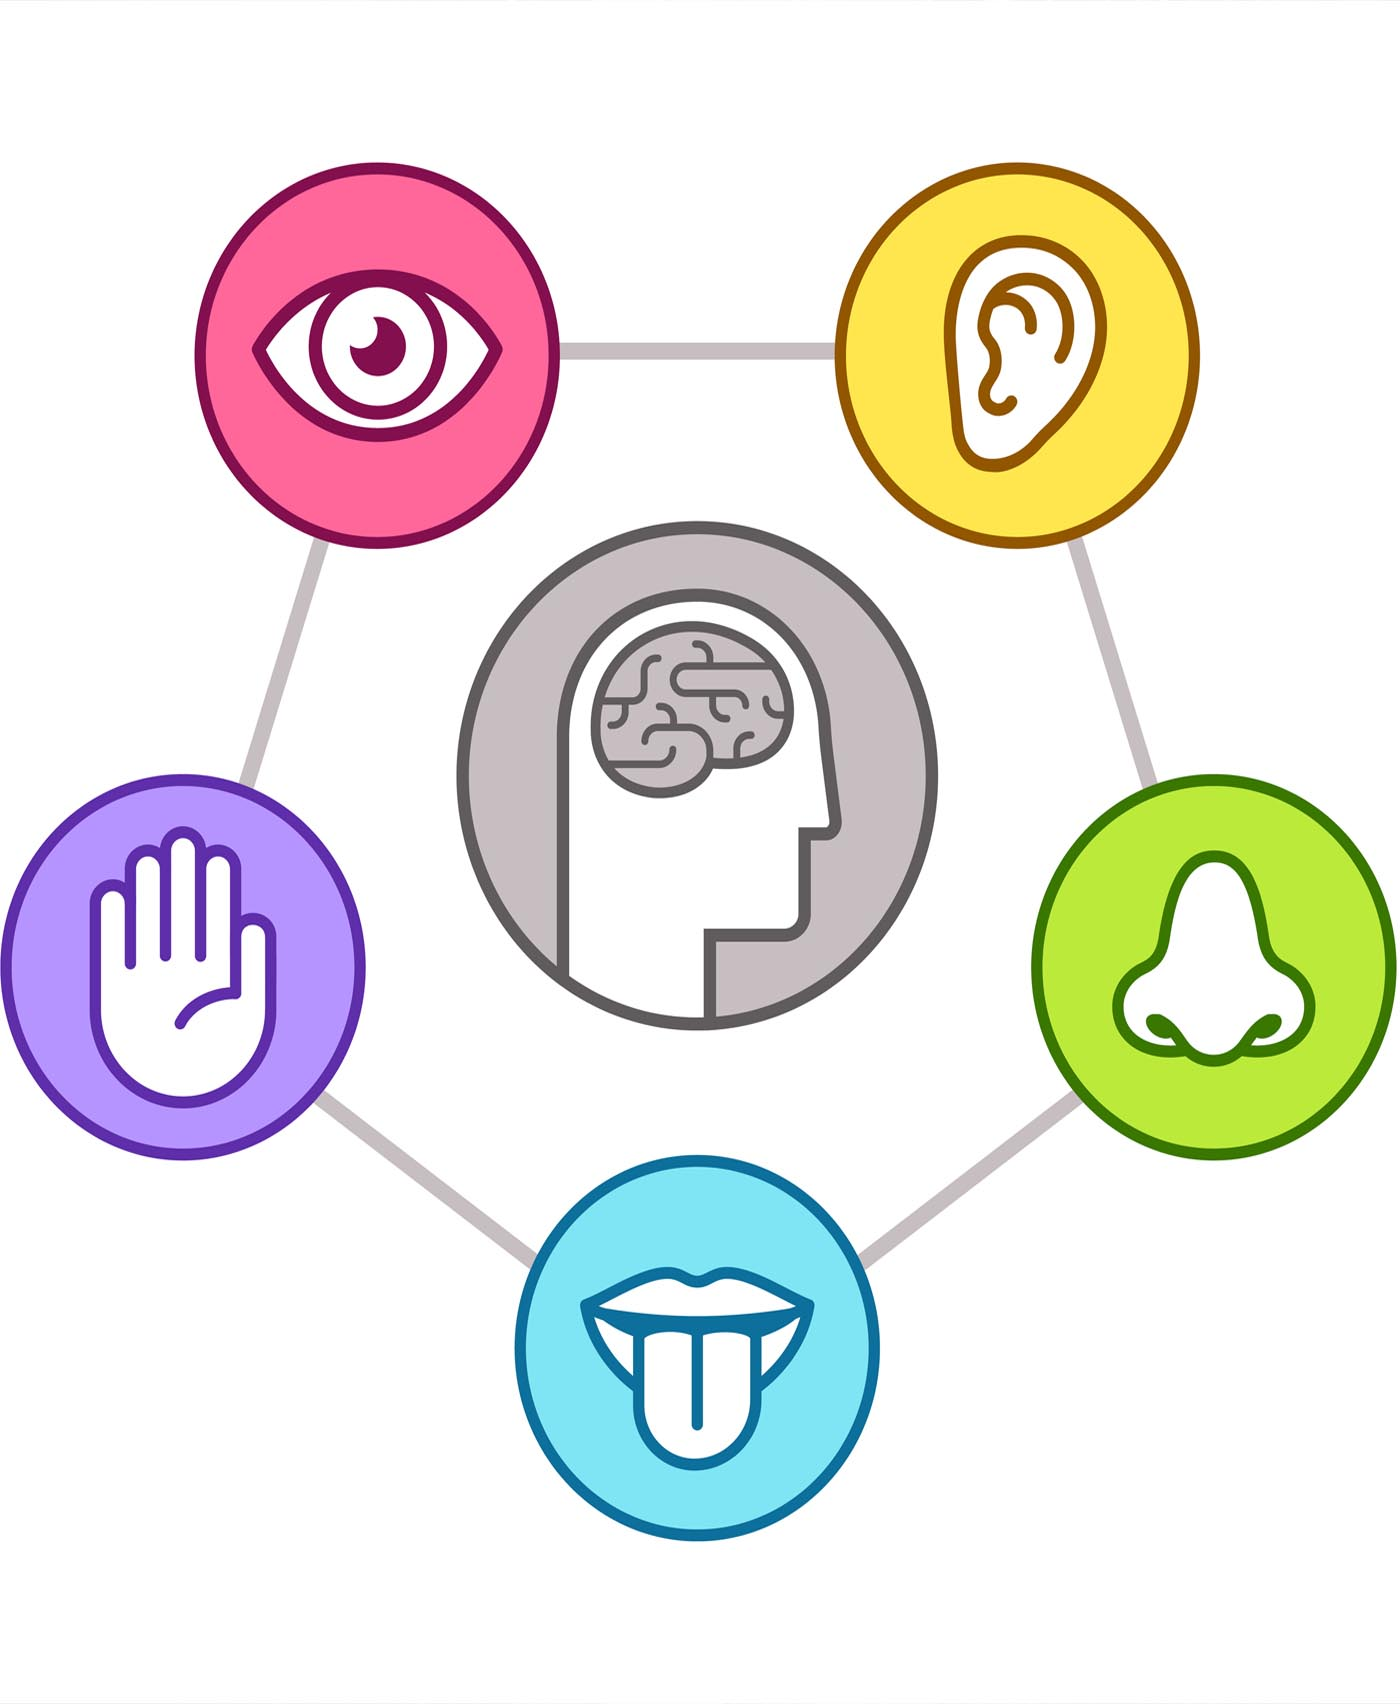 The Five Senses Enhance Customer Experience